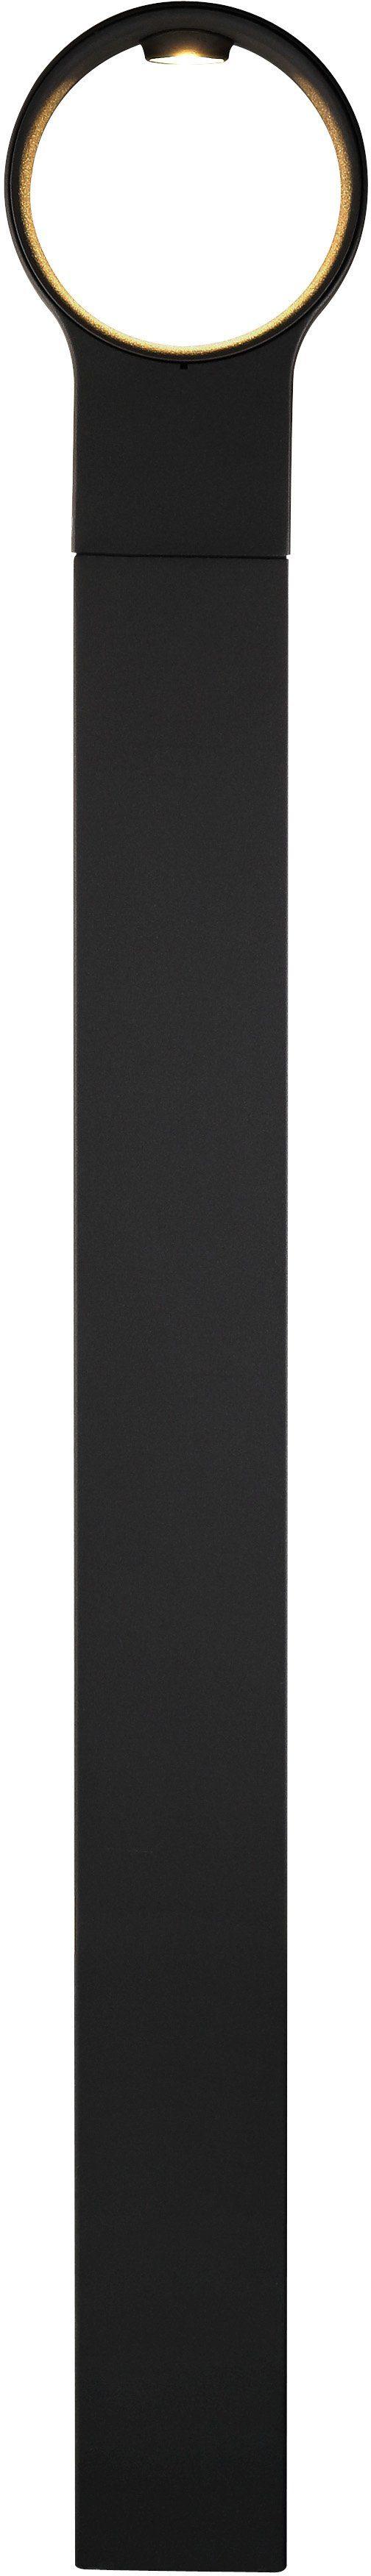 Nordlux LED Außenleuchte, 1 flg., Standleuchte, »RING«